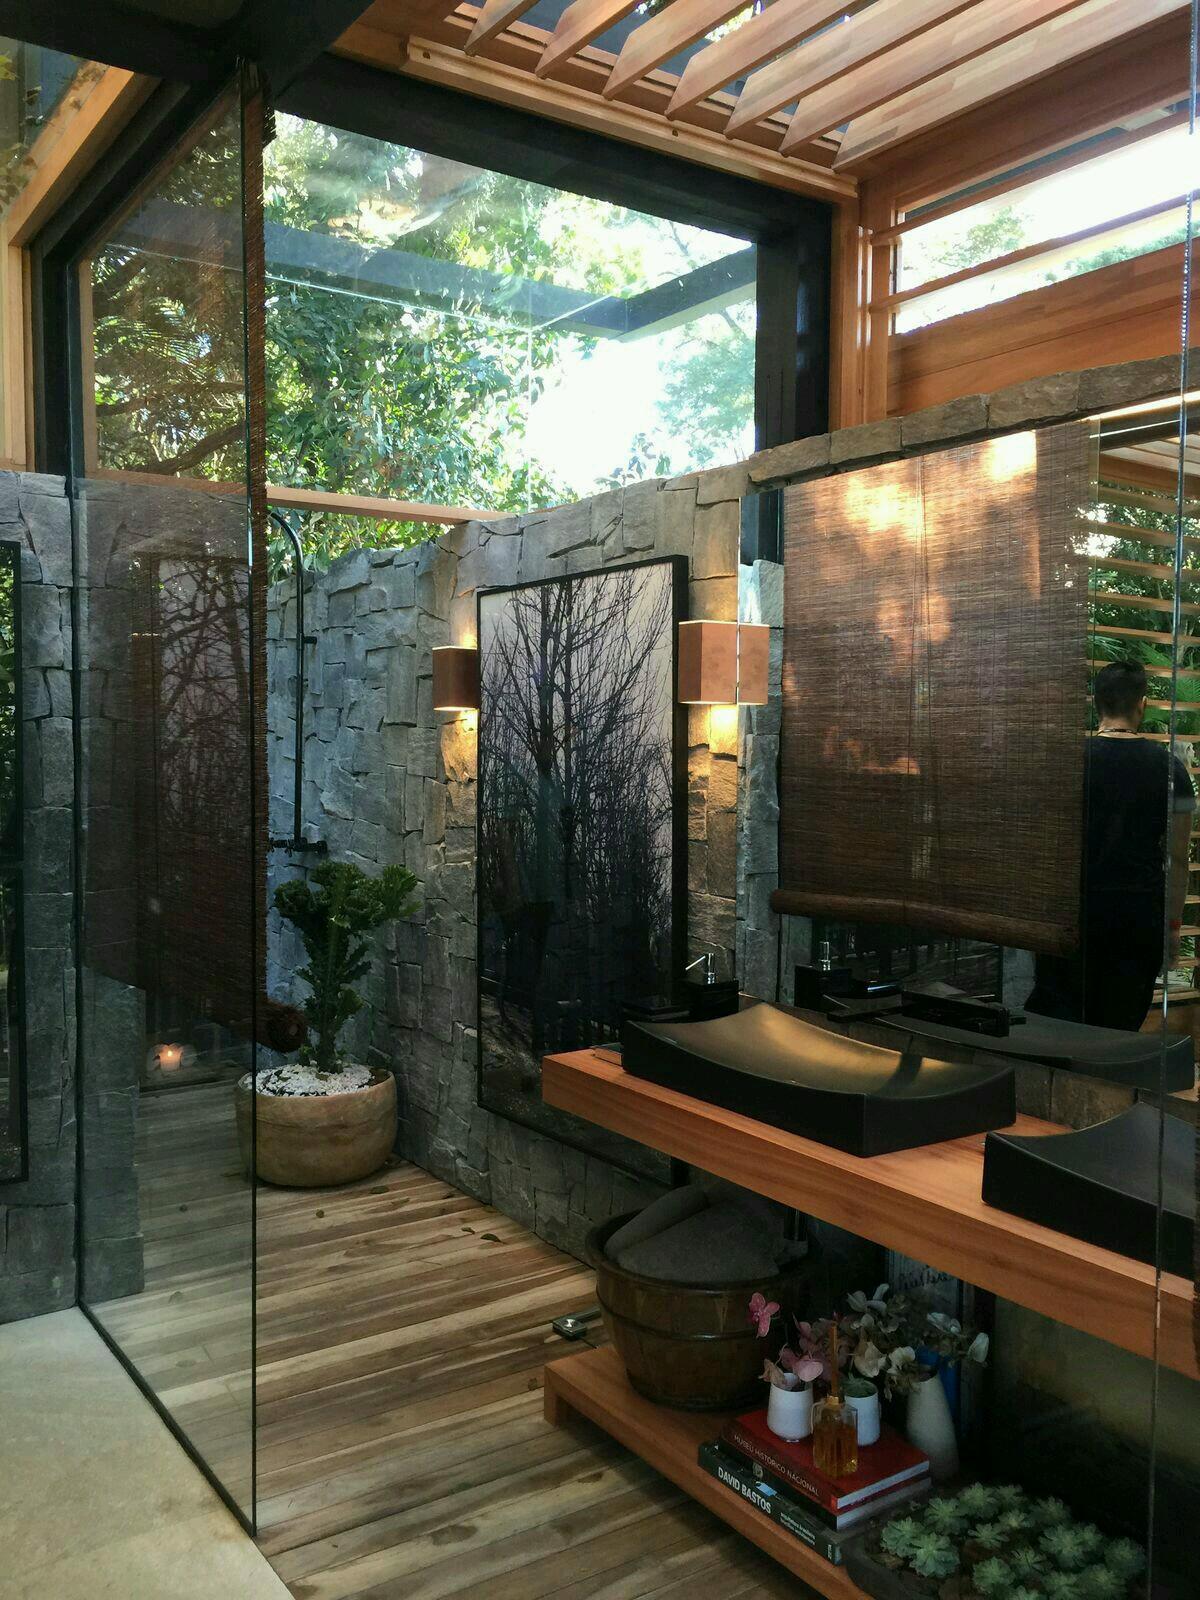 20 Amazing Open Bathroom Design Inspiration - The ... on Backyard Bathroom Ideas  id=21409